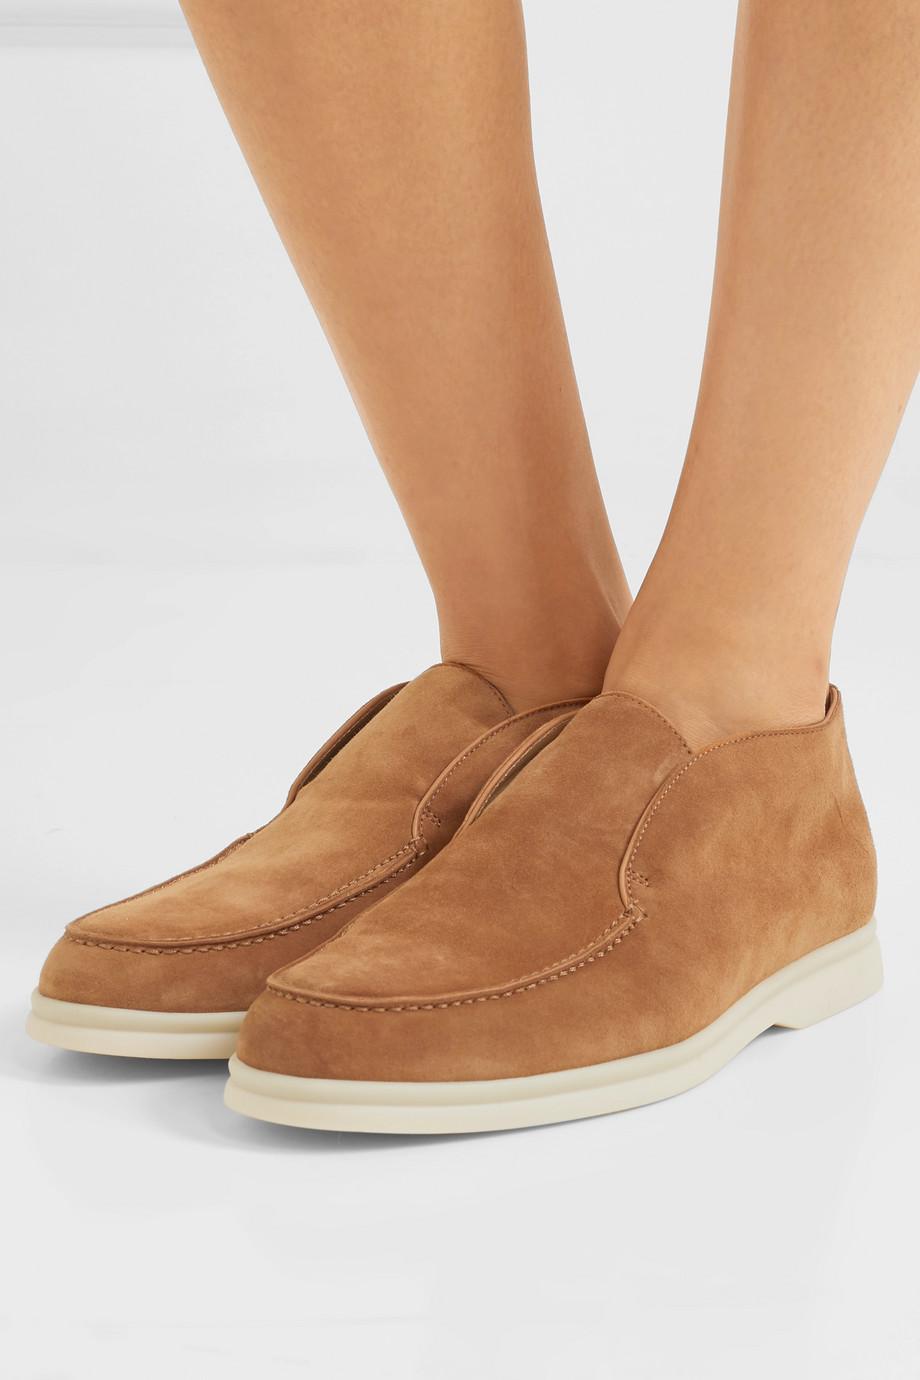 Loro Piana Open Walk 绒面革乐福鞋